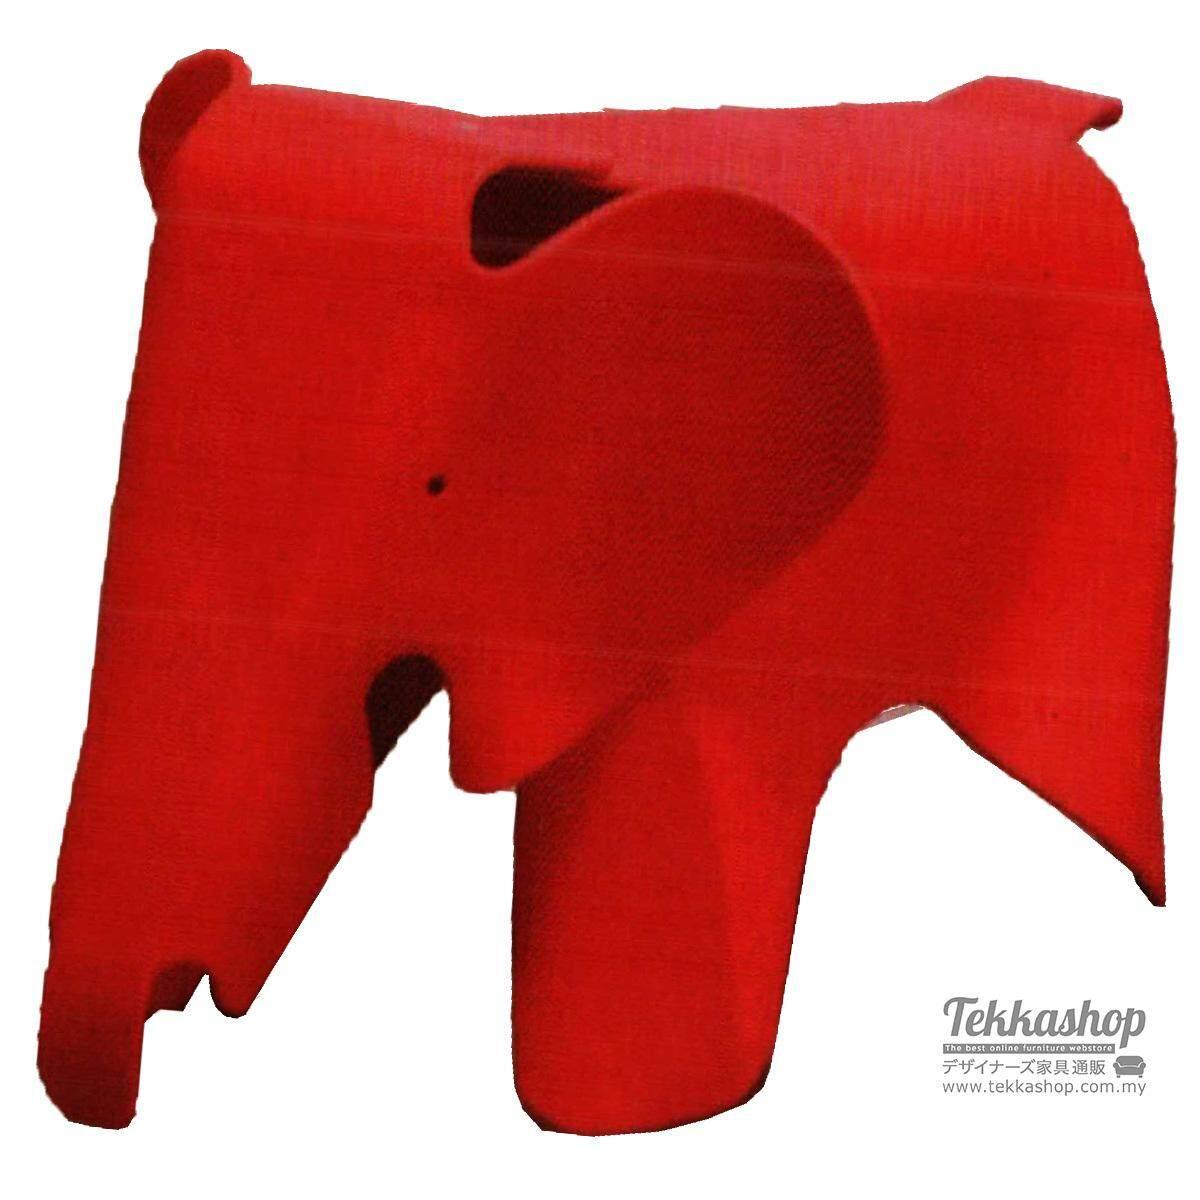 Tekkashop KKM3158LC Kindergarden Kid Furniture Metal Made Funky Elephant Ottoman Seat, Red